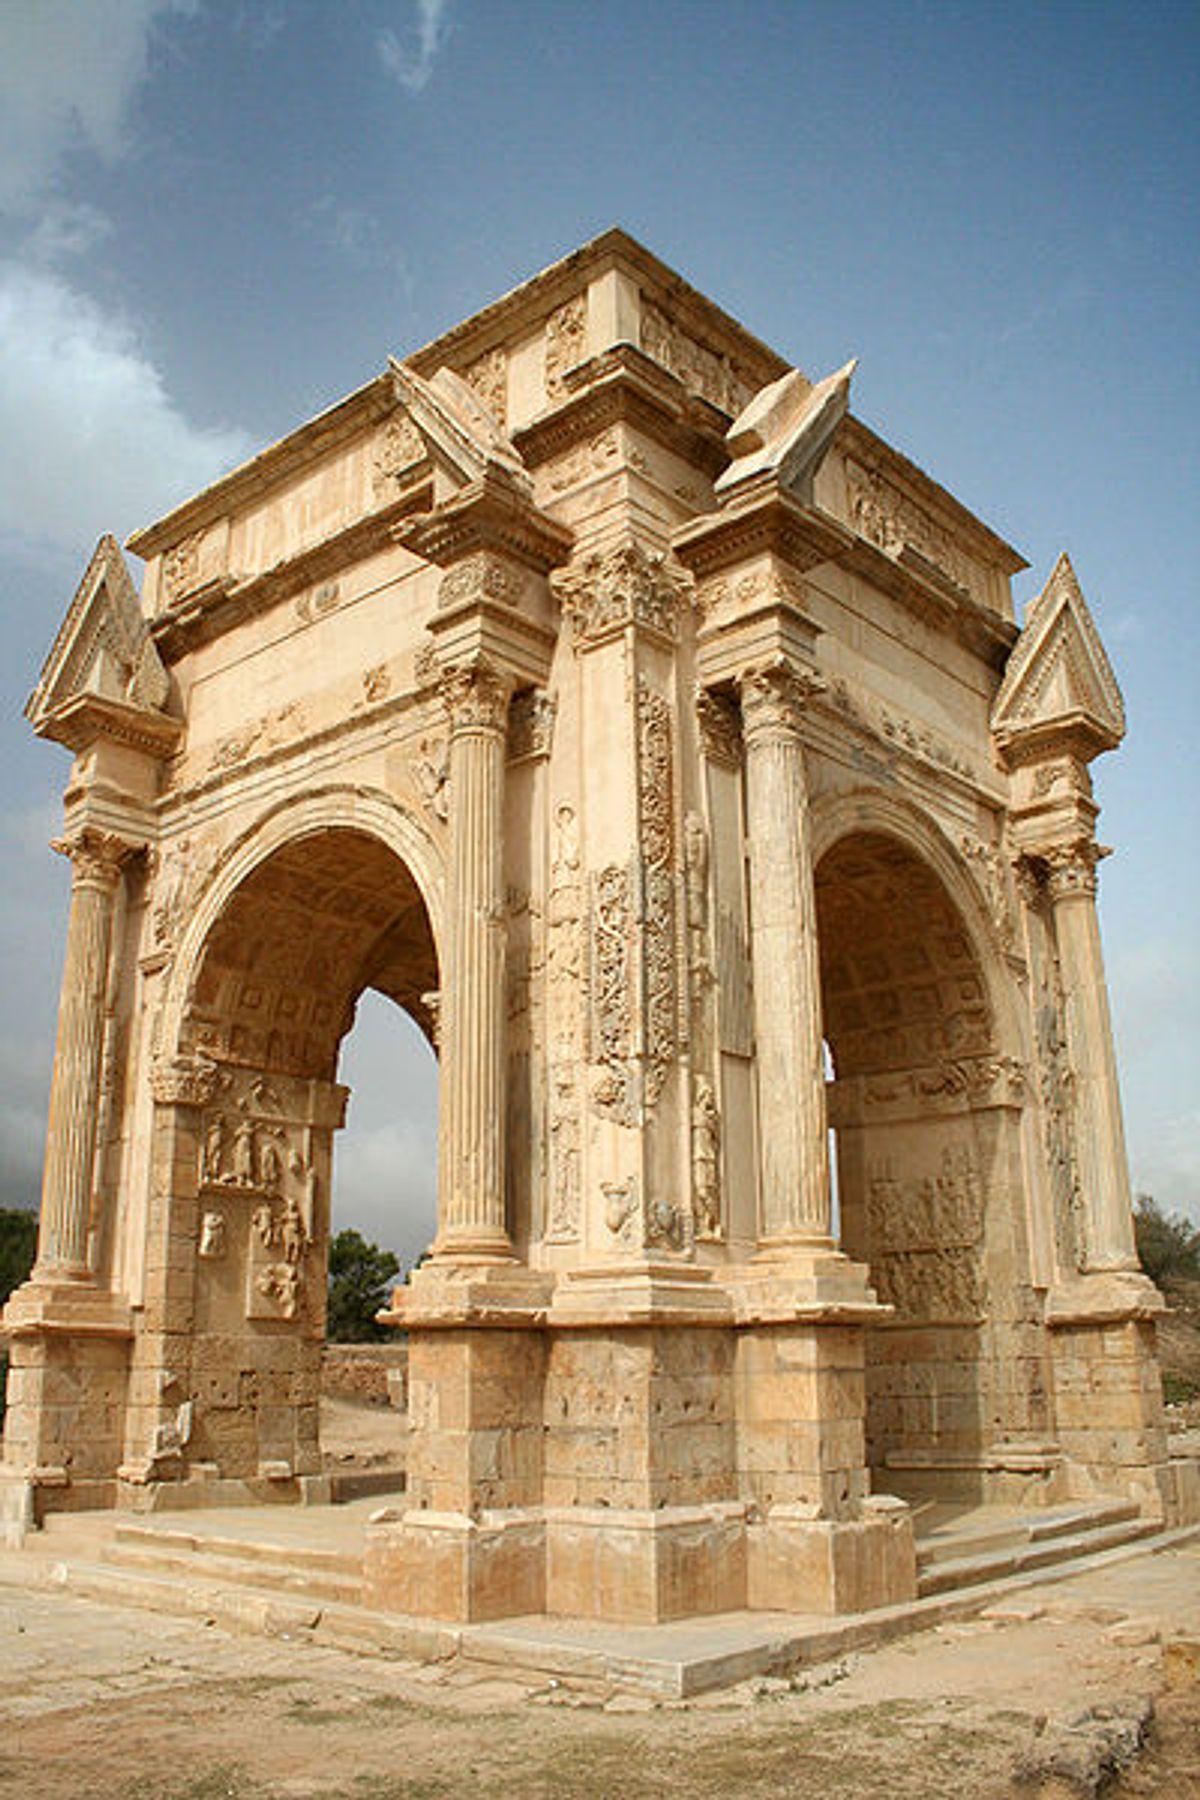 The Arch of Septimius Severus at Leptis Magna